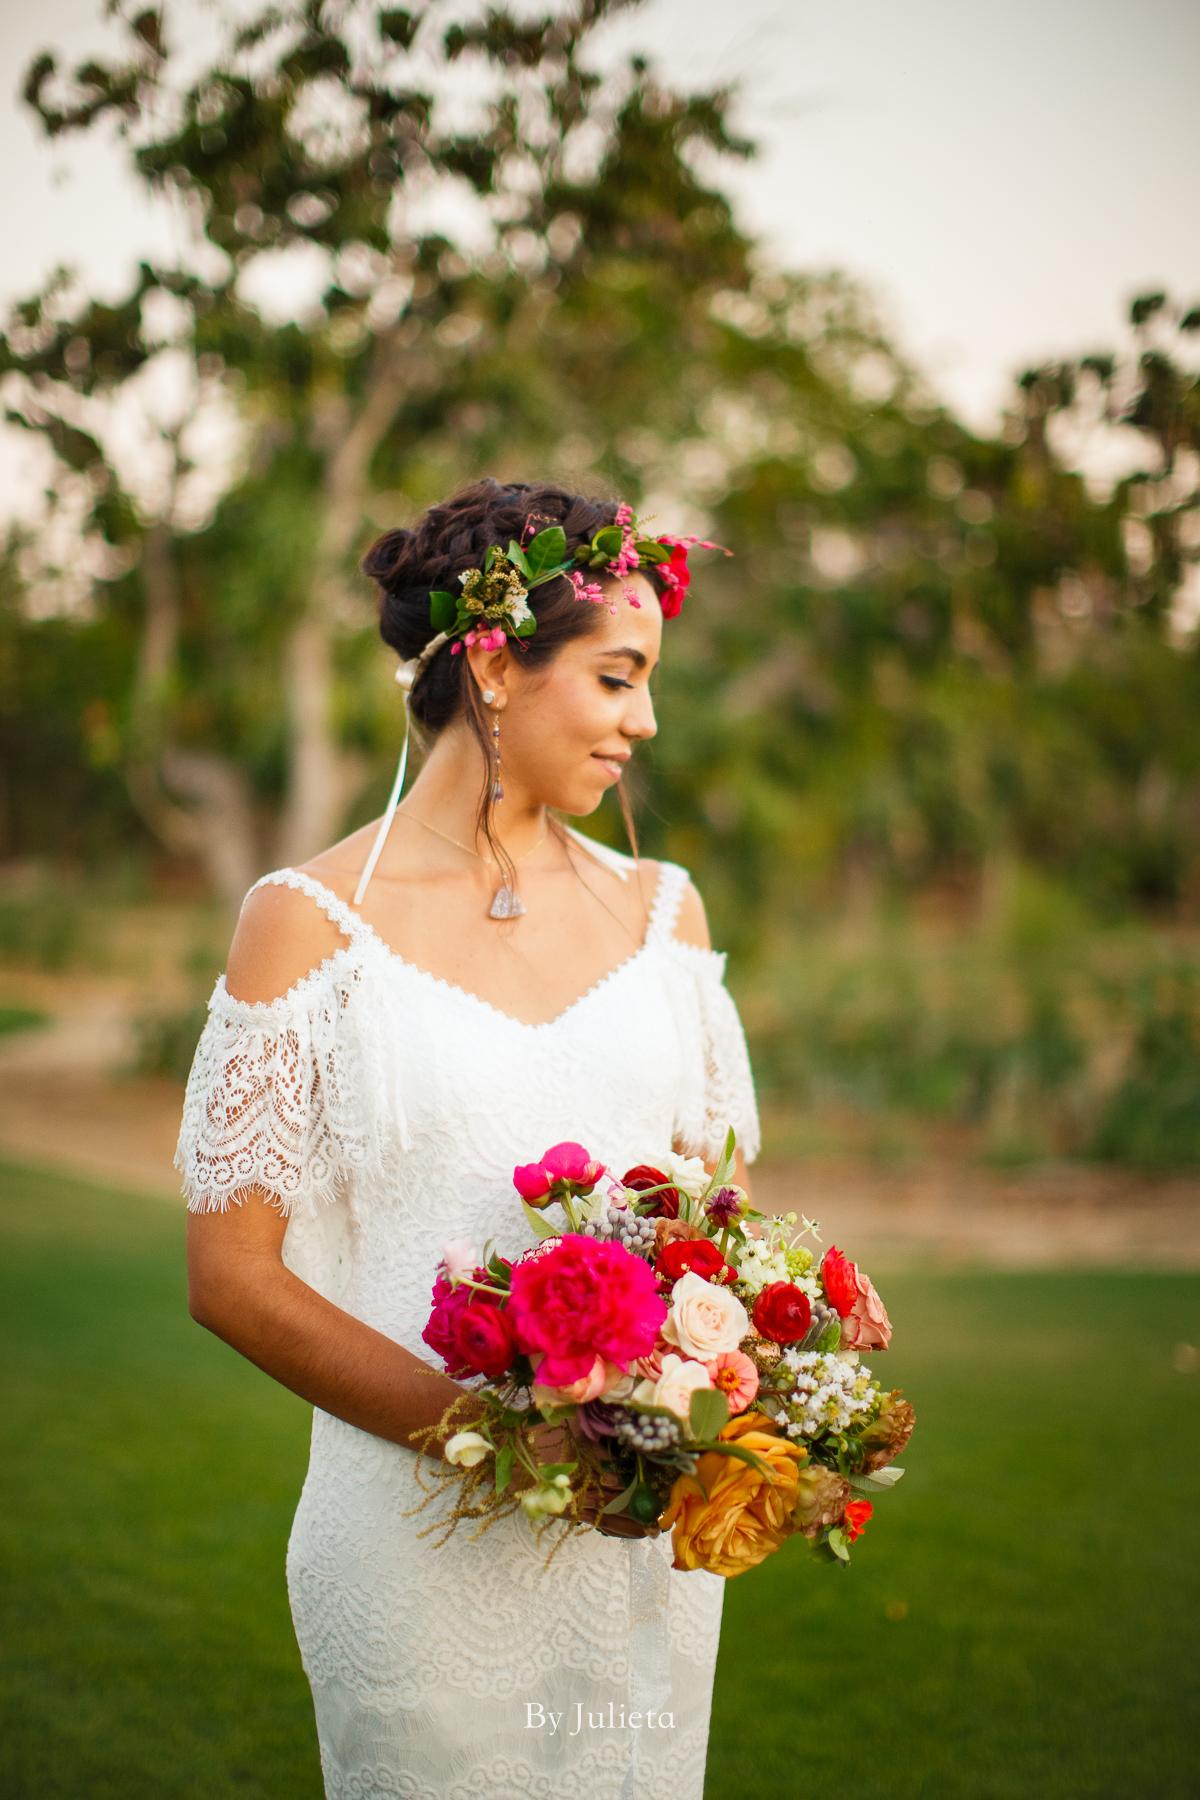 Floras Farm Cabo Wedding, Sory and Kane, Julieta Amezcua Photography. (295 of 364).jpg